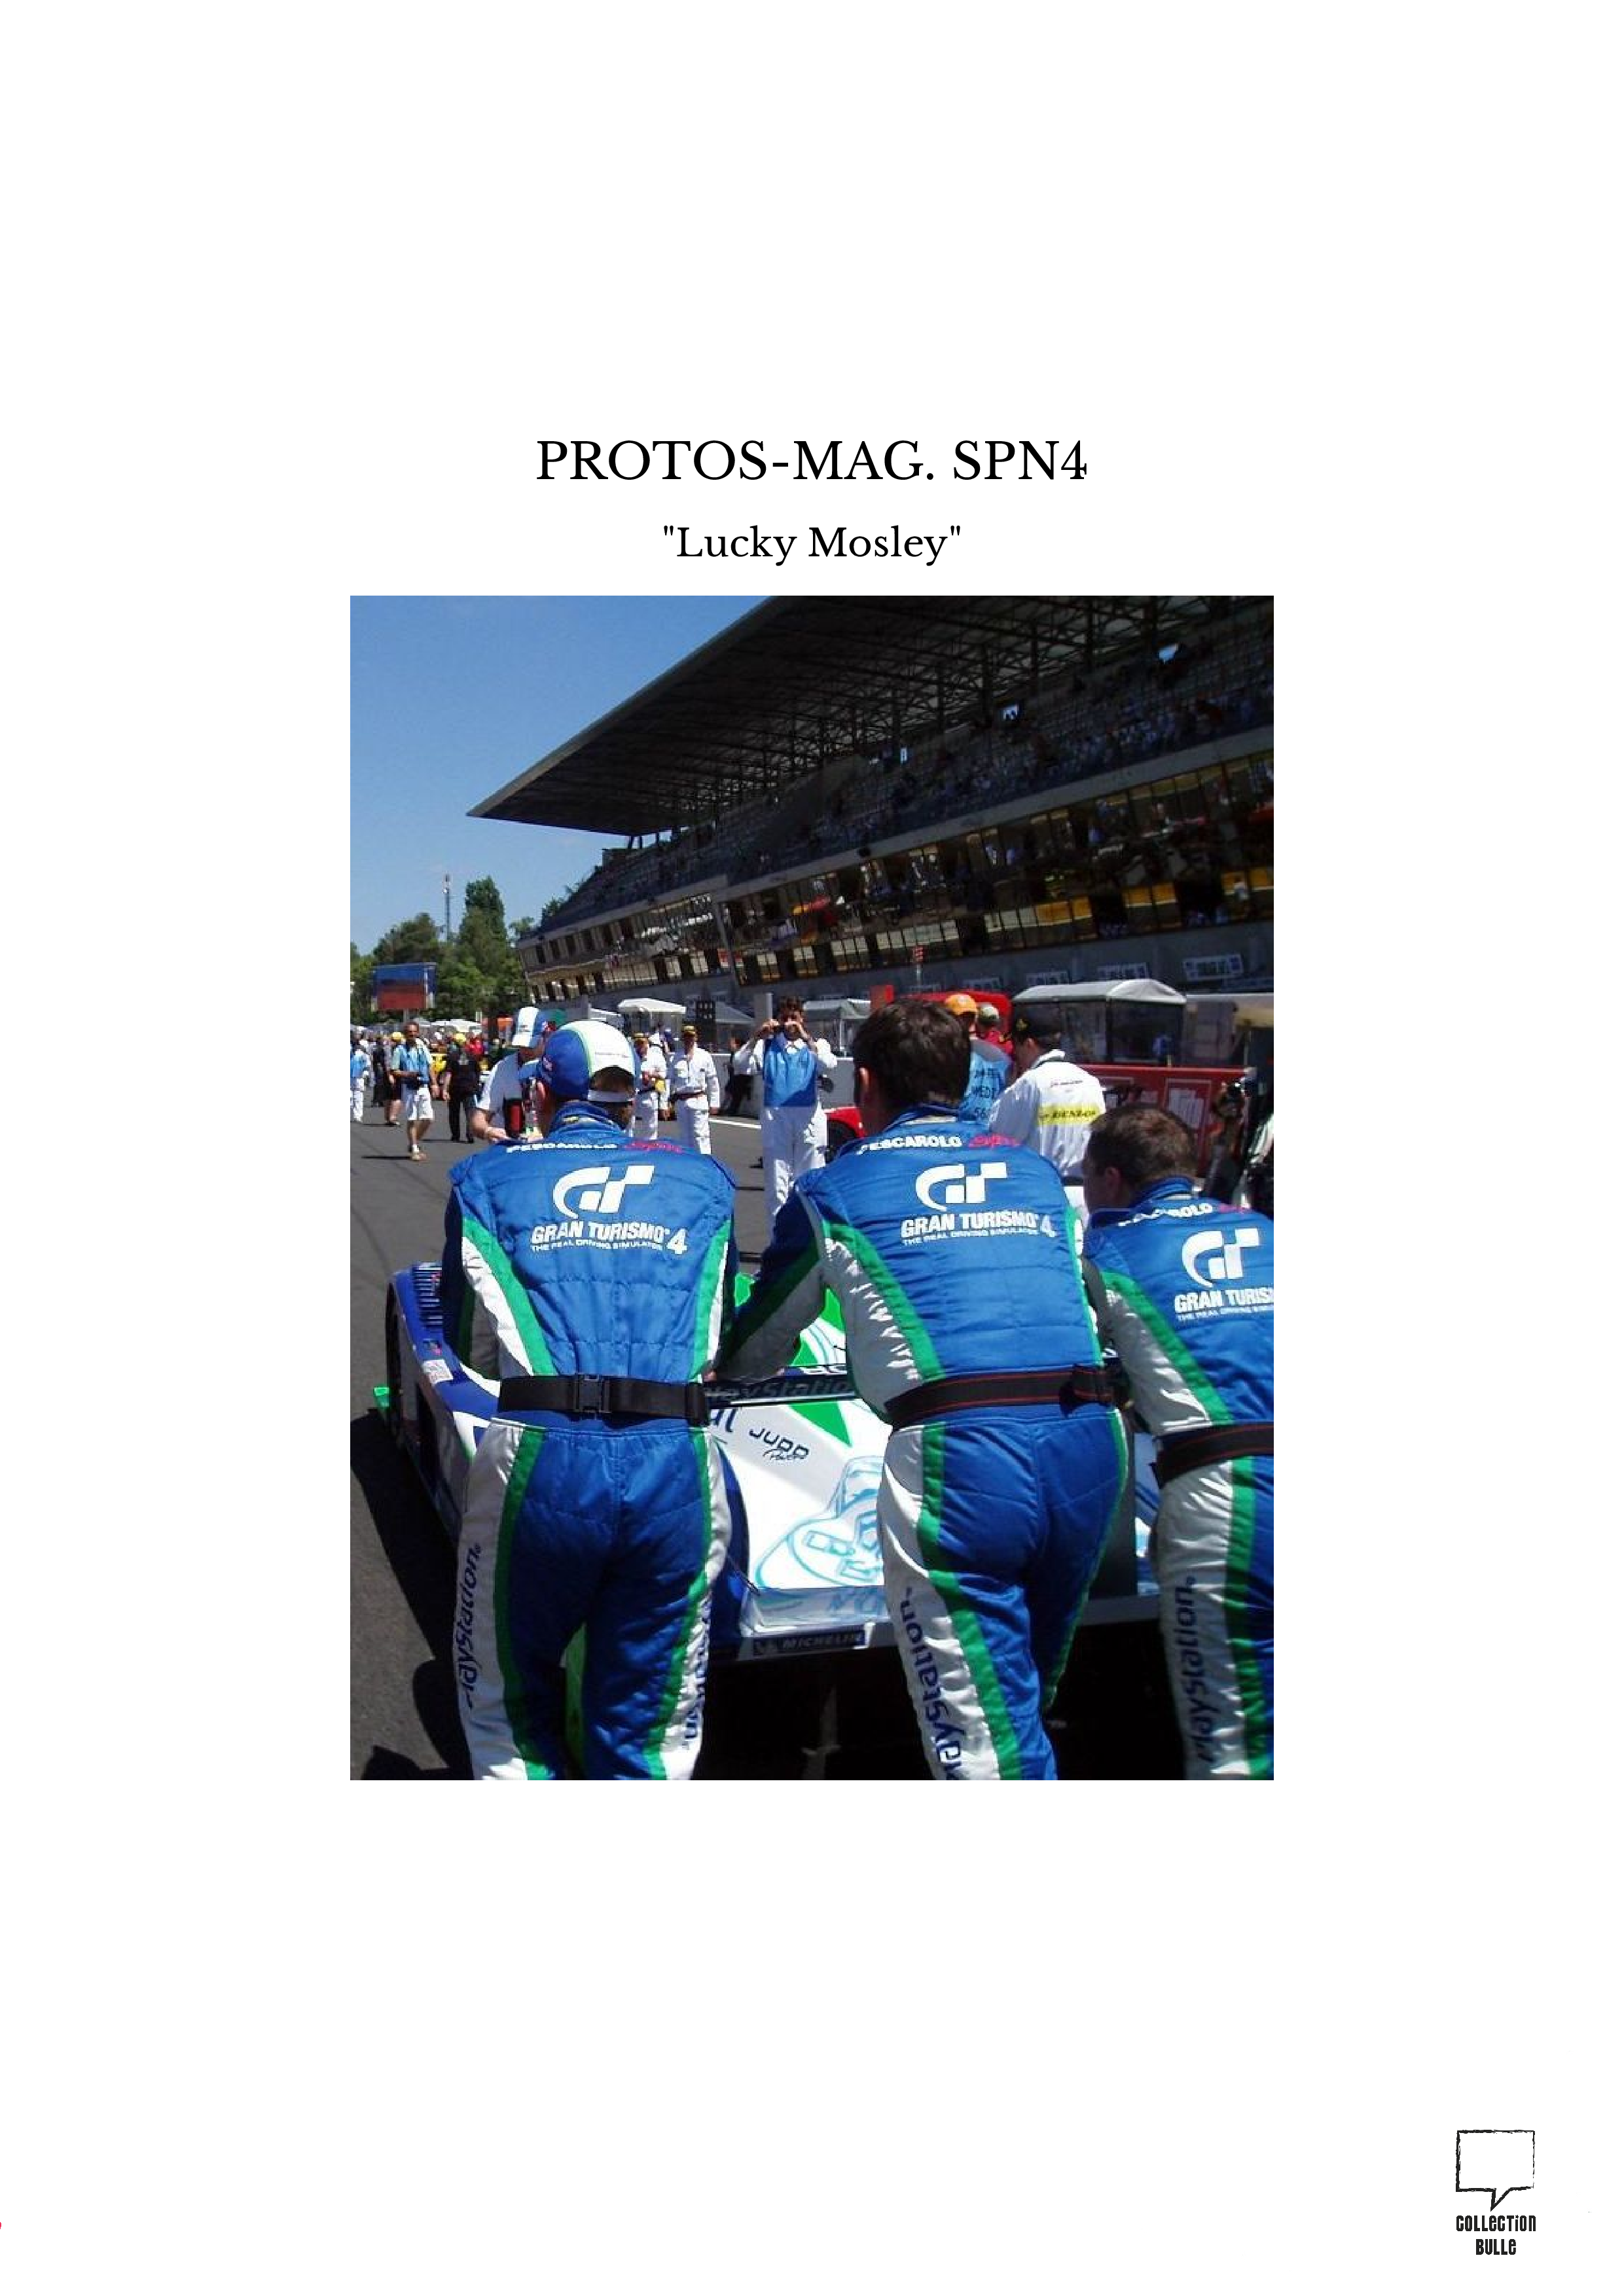 PROTOS-MAG. SPN4